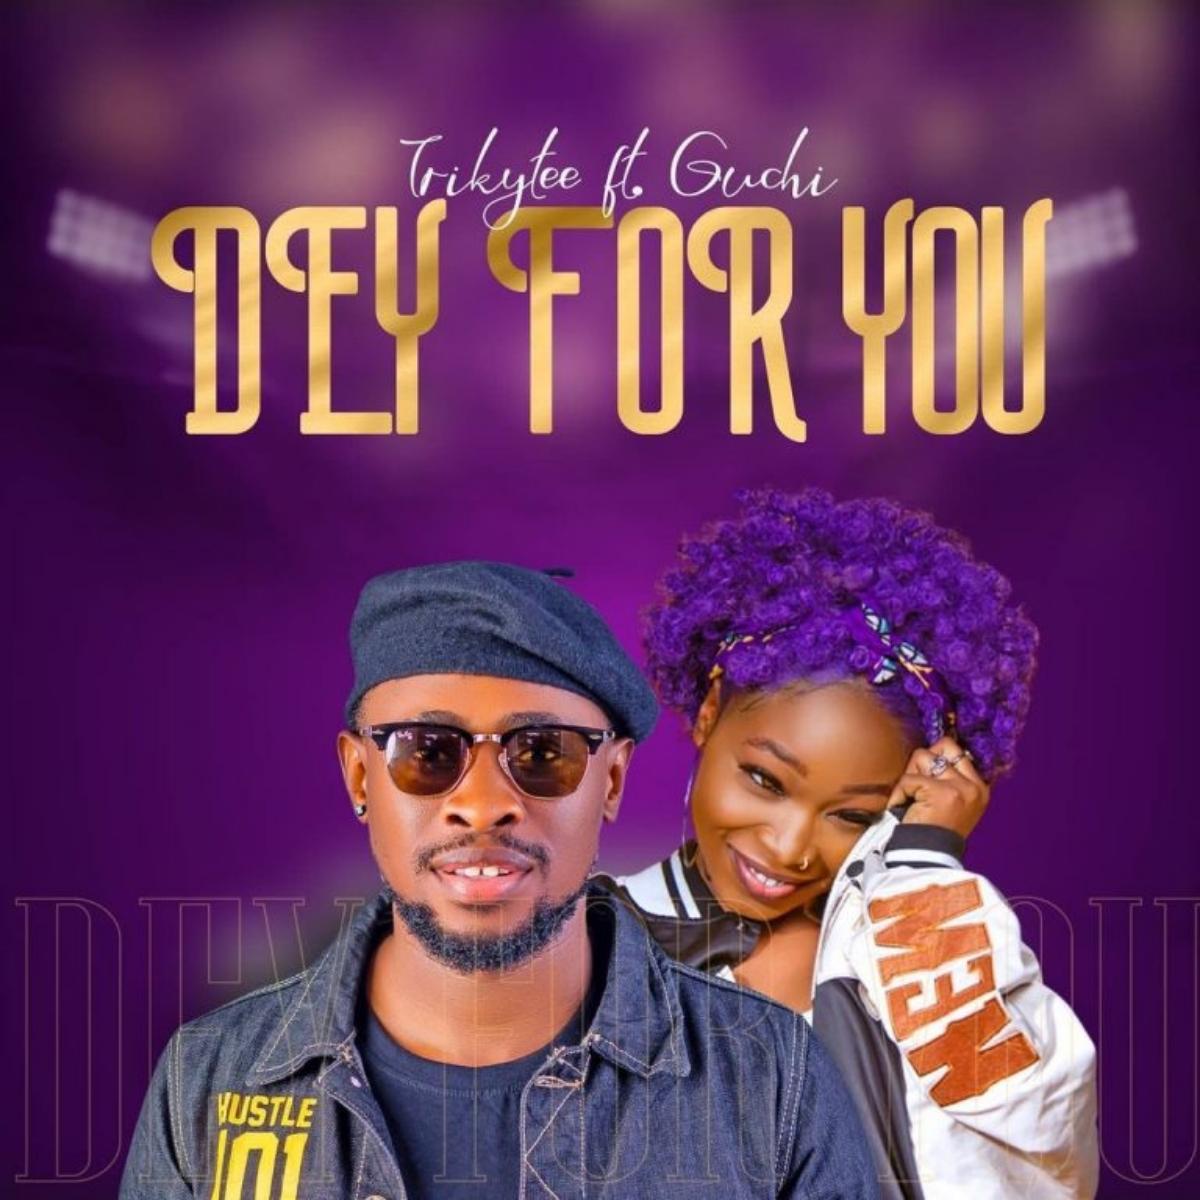 Trikytee – Dey For You Ft. Guchi mp3 download